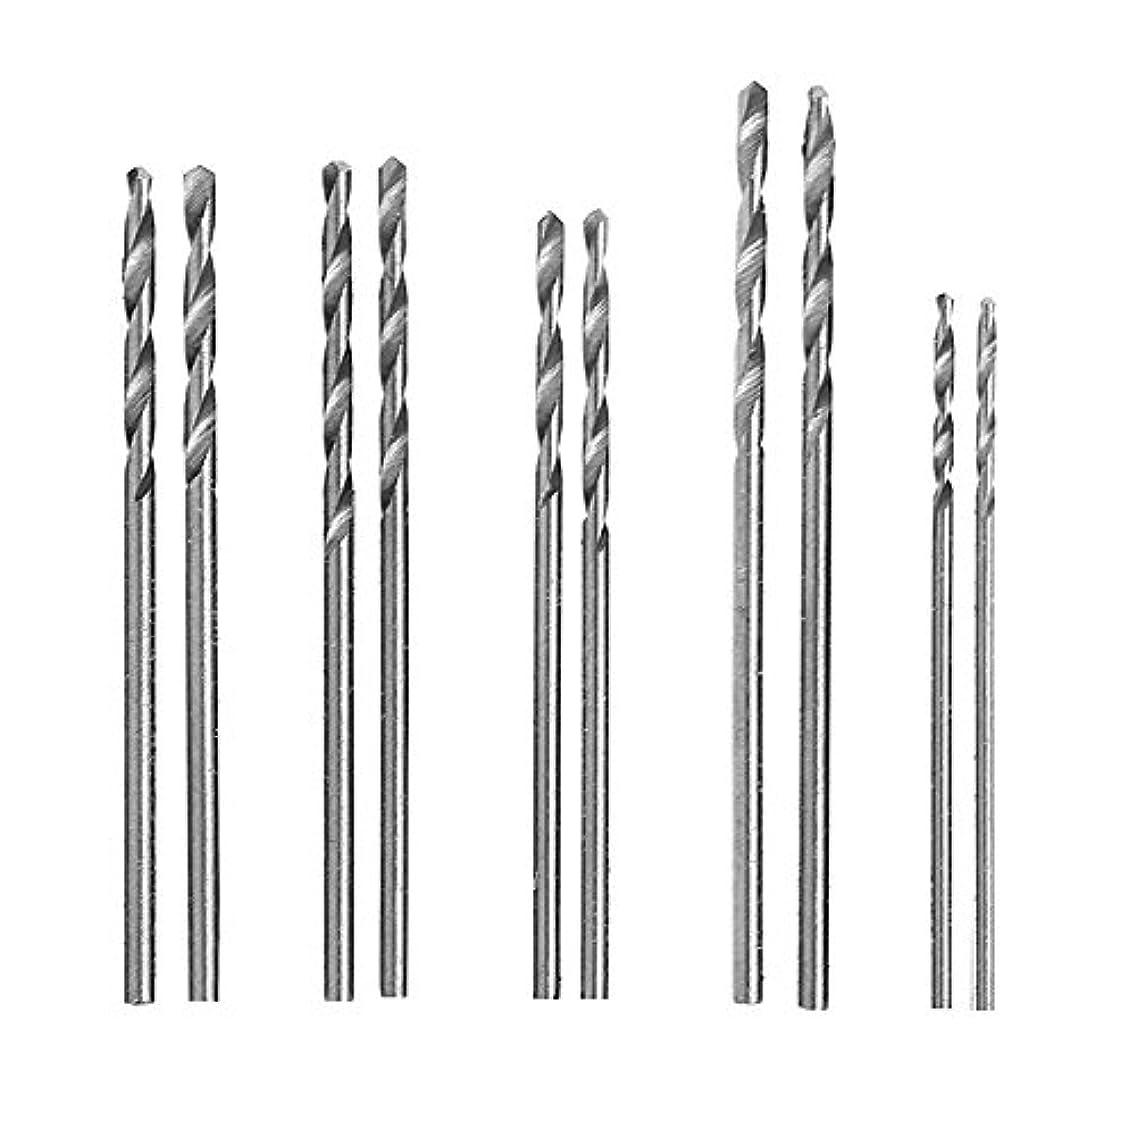 Misright 10Pcs HSS White Twist Drill Bit Set-1-1.5mm General Purpose For Glass Soft Metal Tile Stone